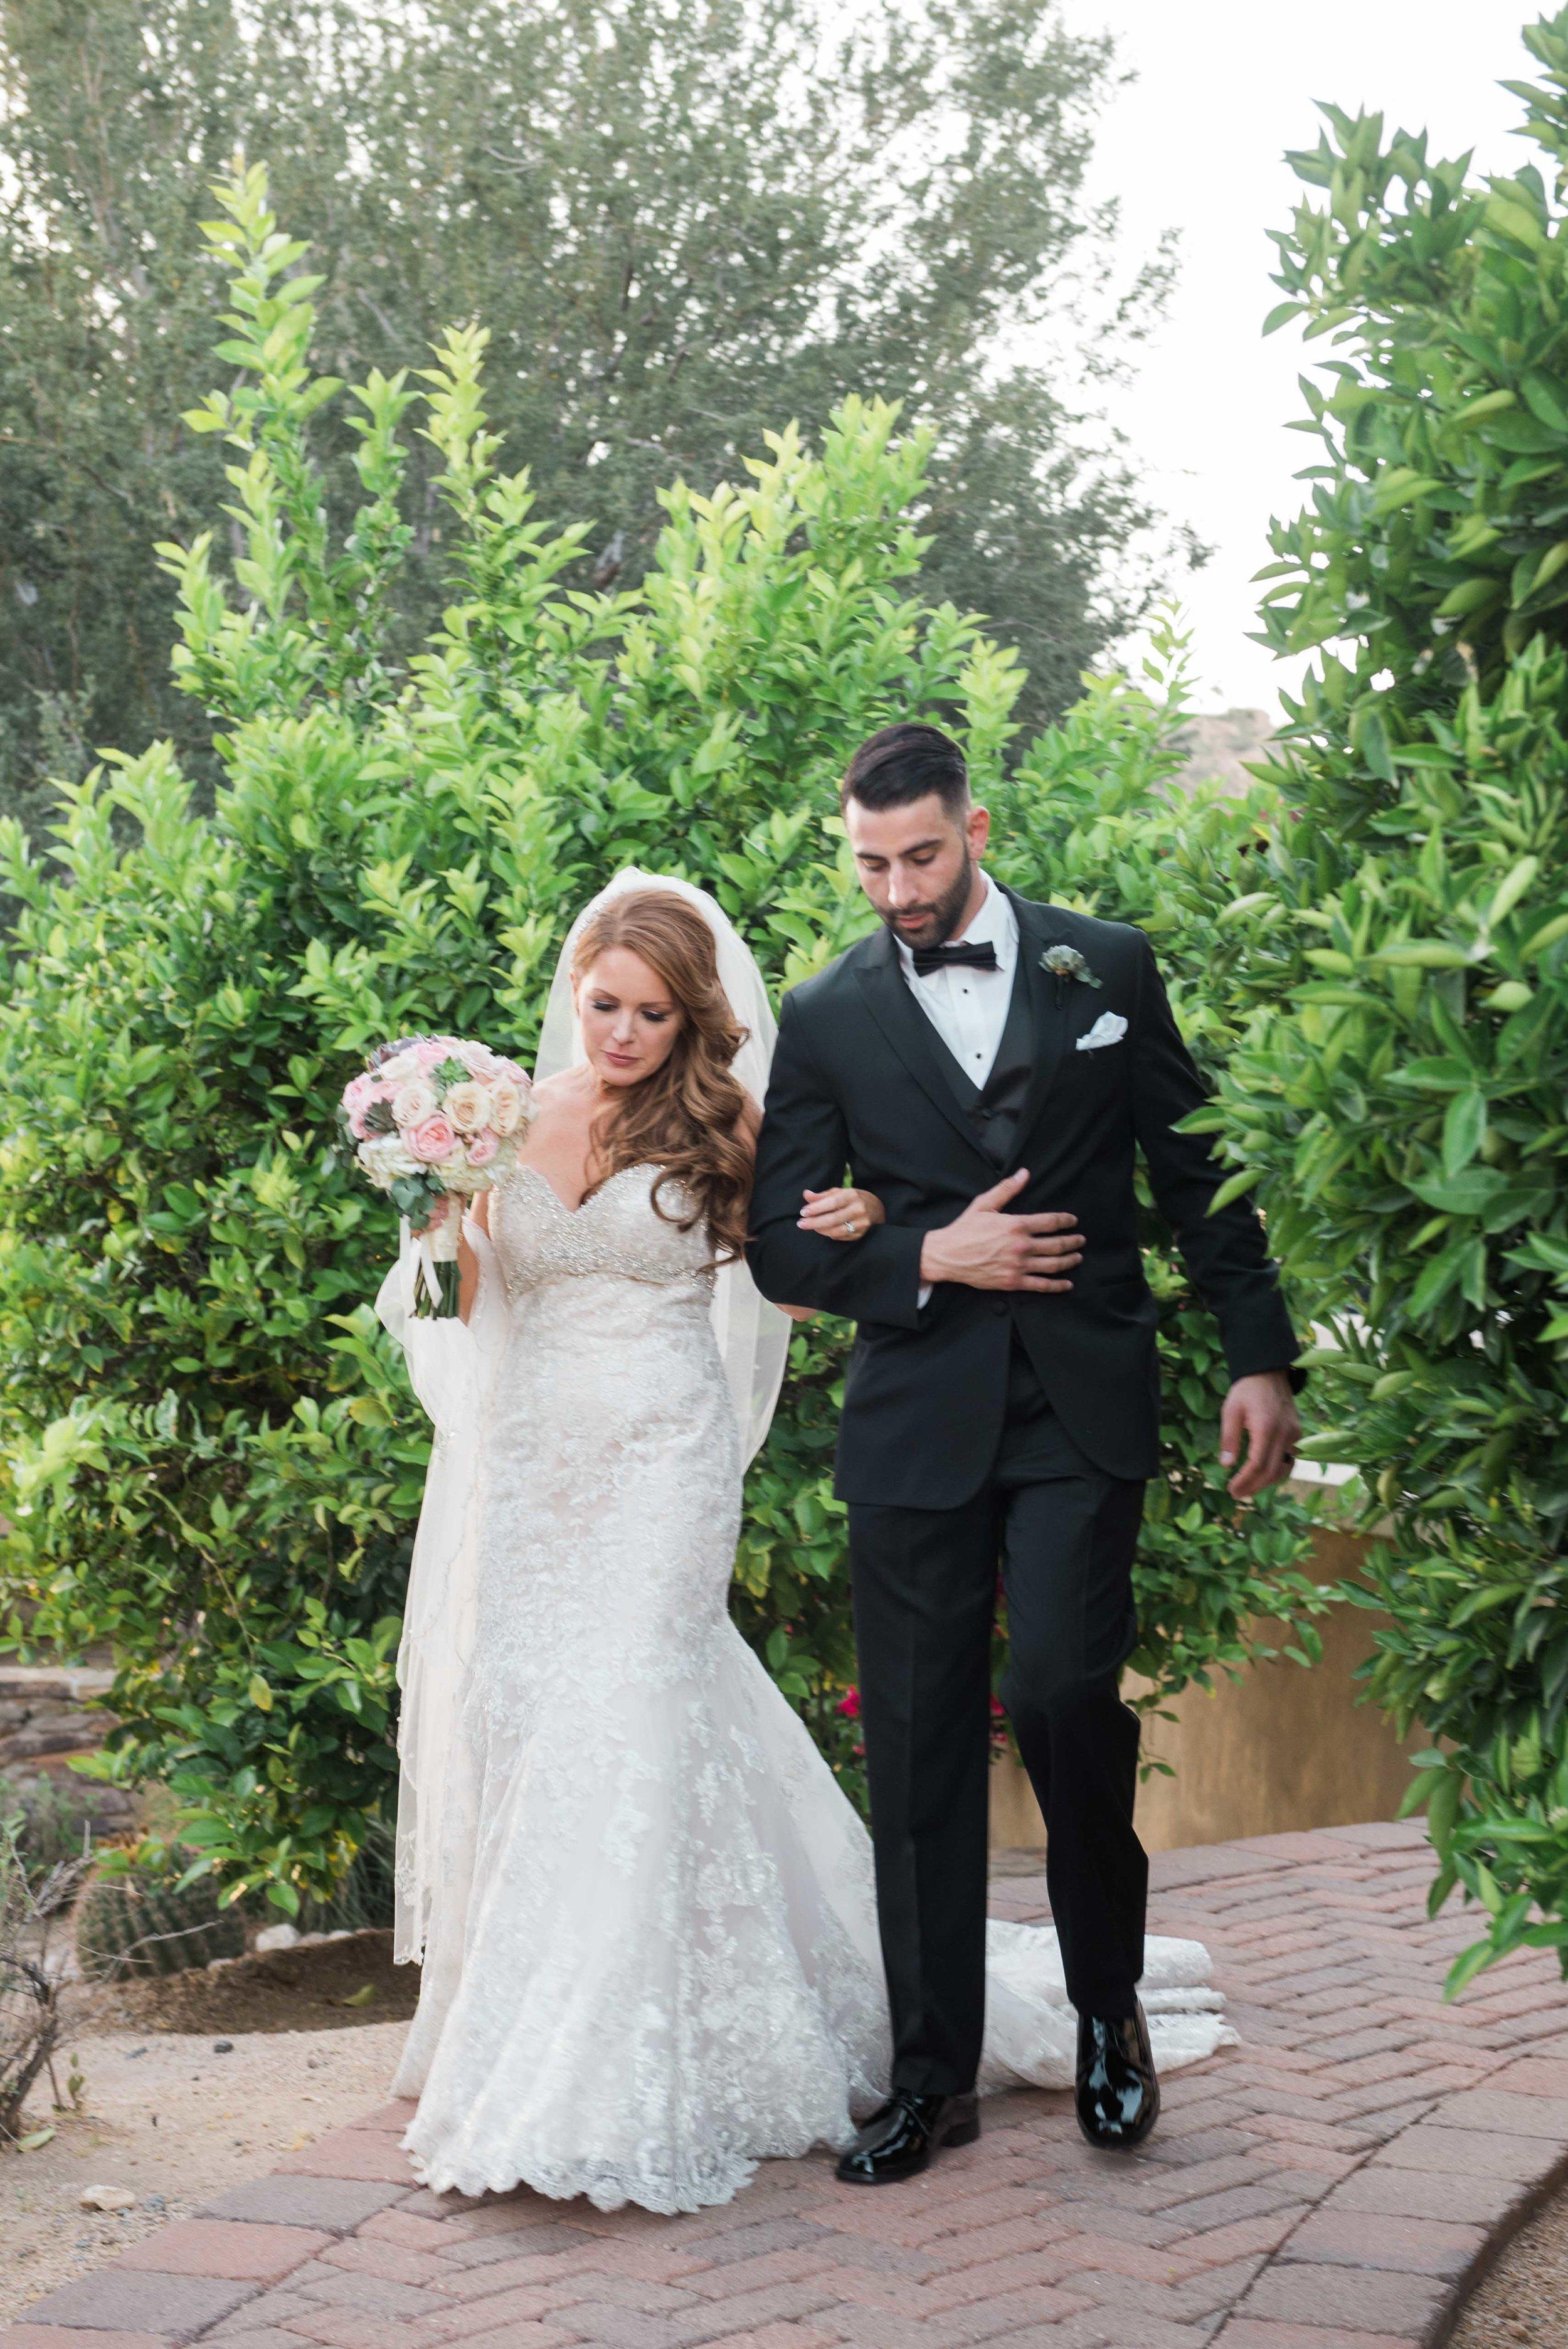 weddingwebsitesmallerpics-179.jpg